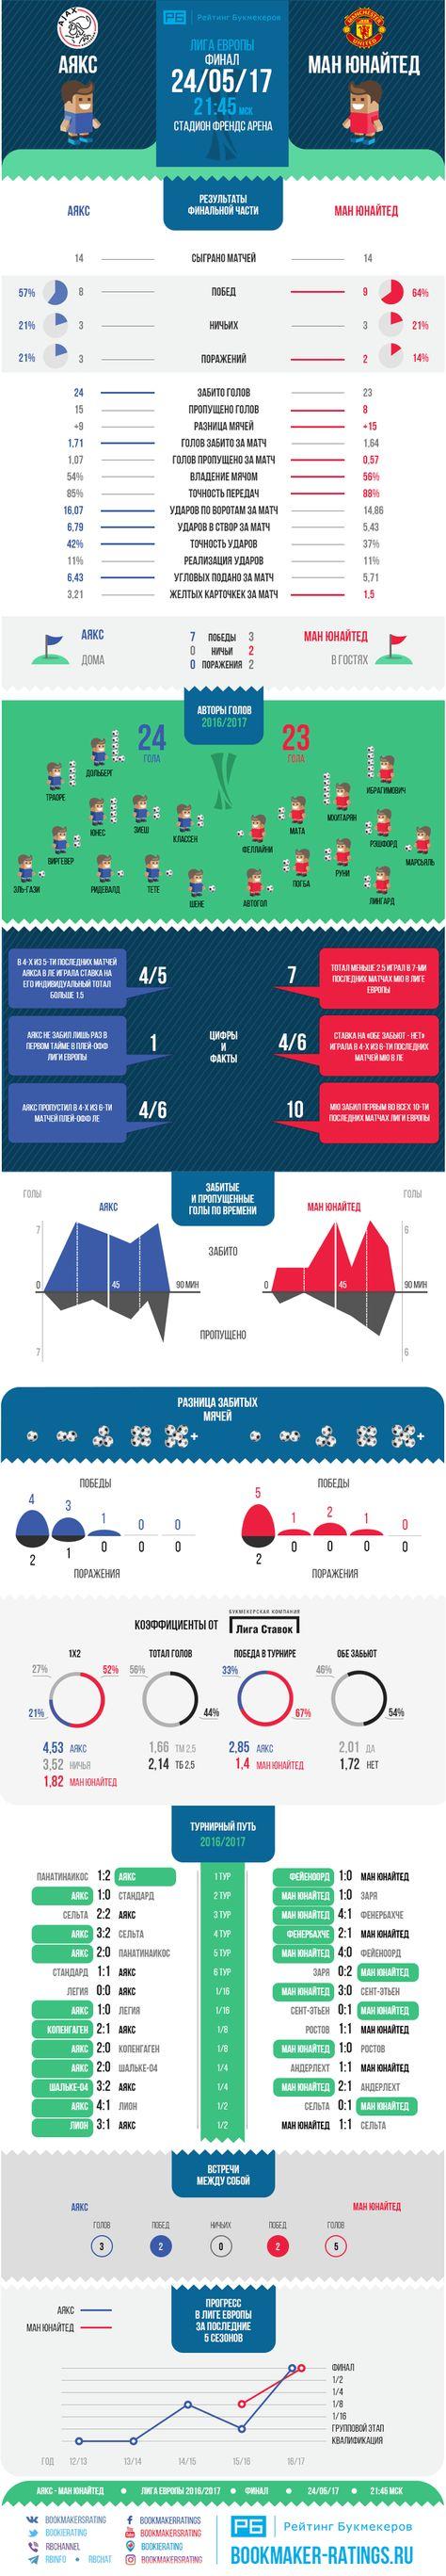 Статистика для матча Аякс  Манчестер Юнайтед от Рейтинга Букмекеров